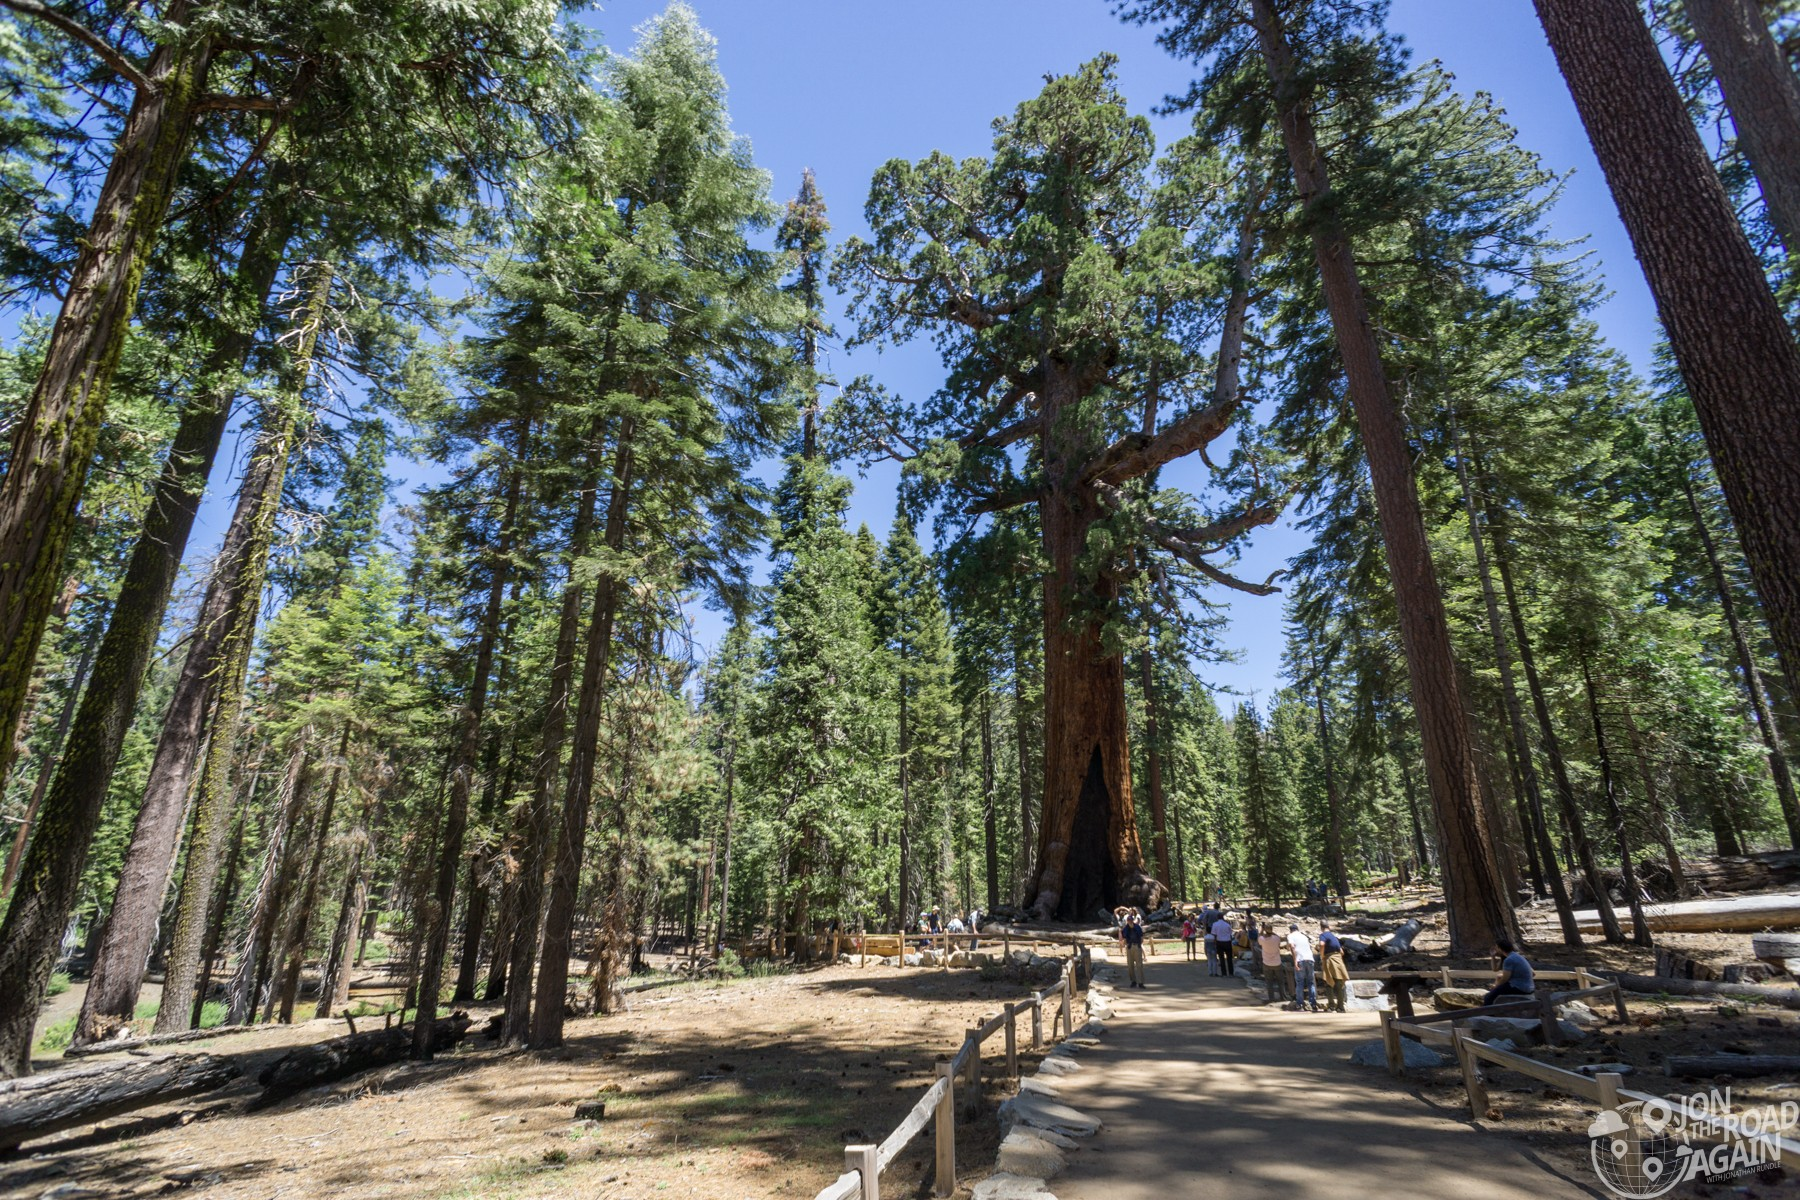 Grizzly Giant Mariposa Grove Yosemite